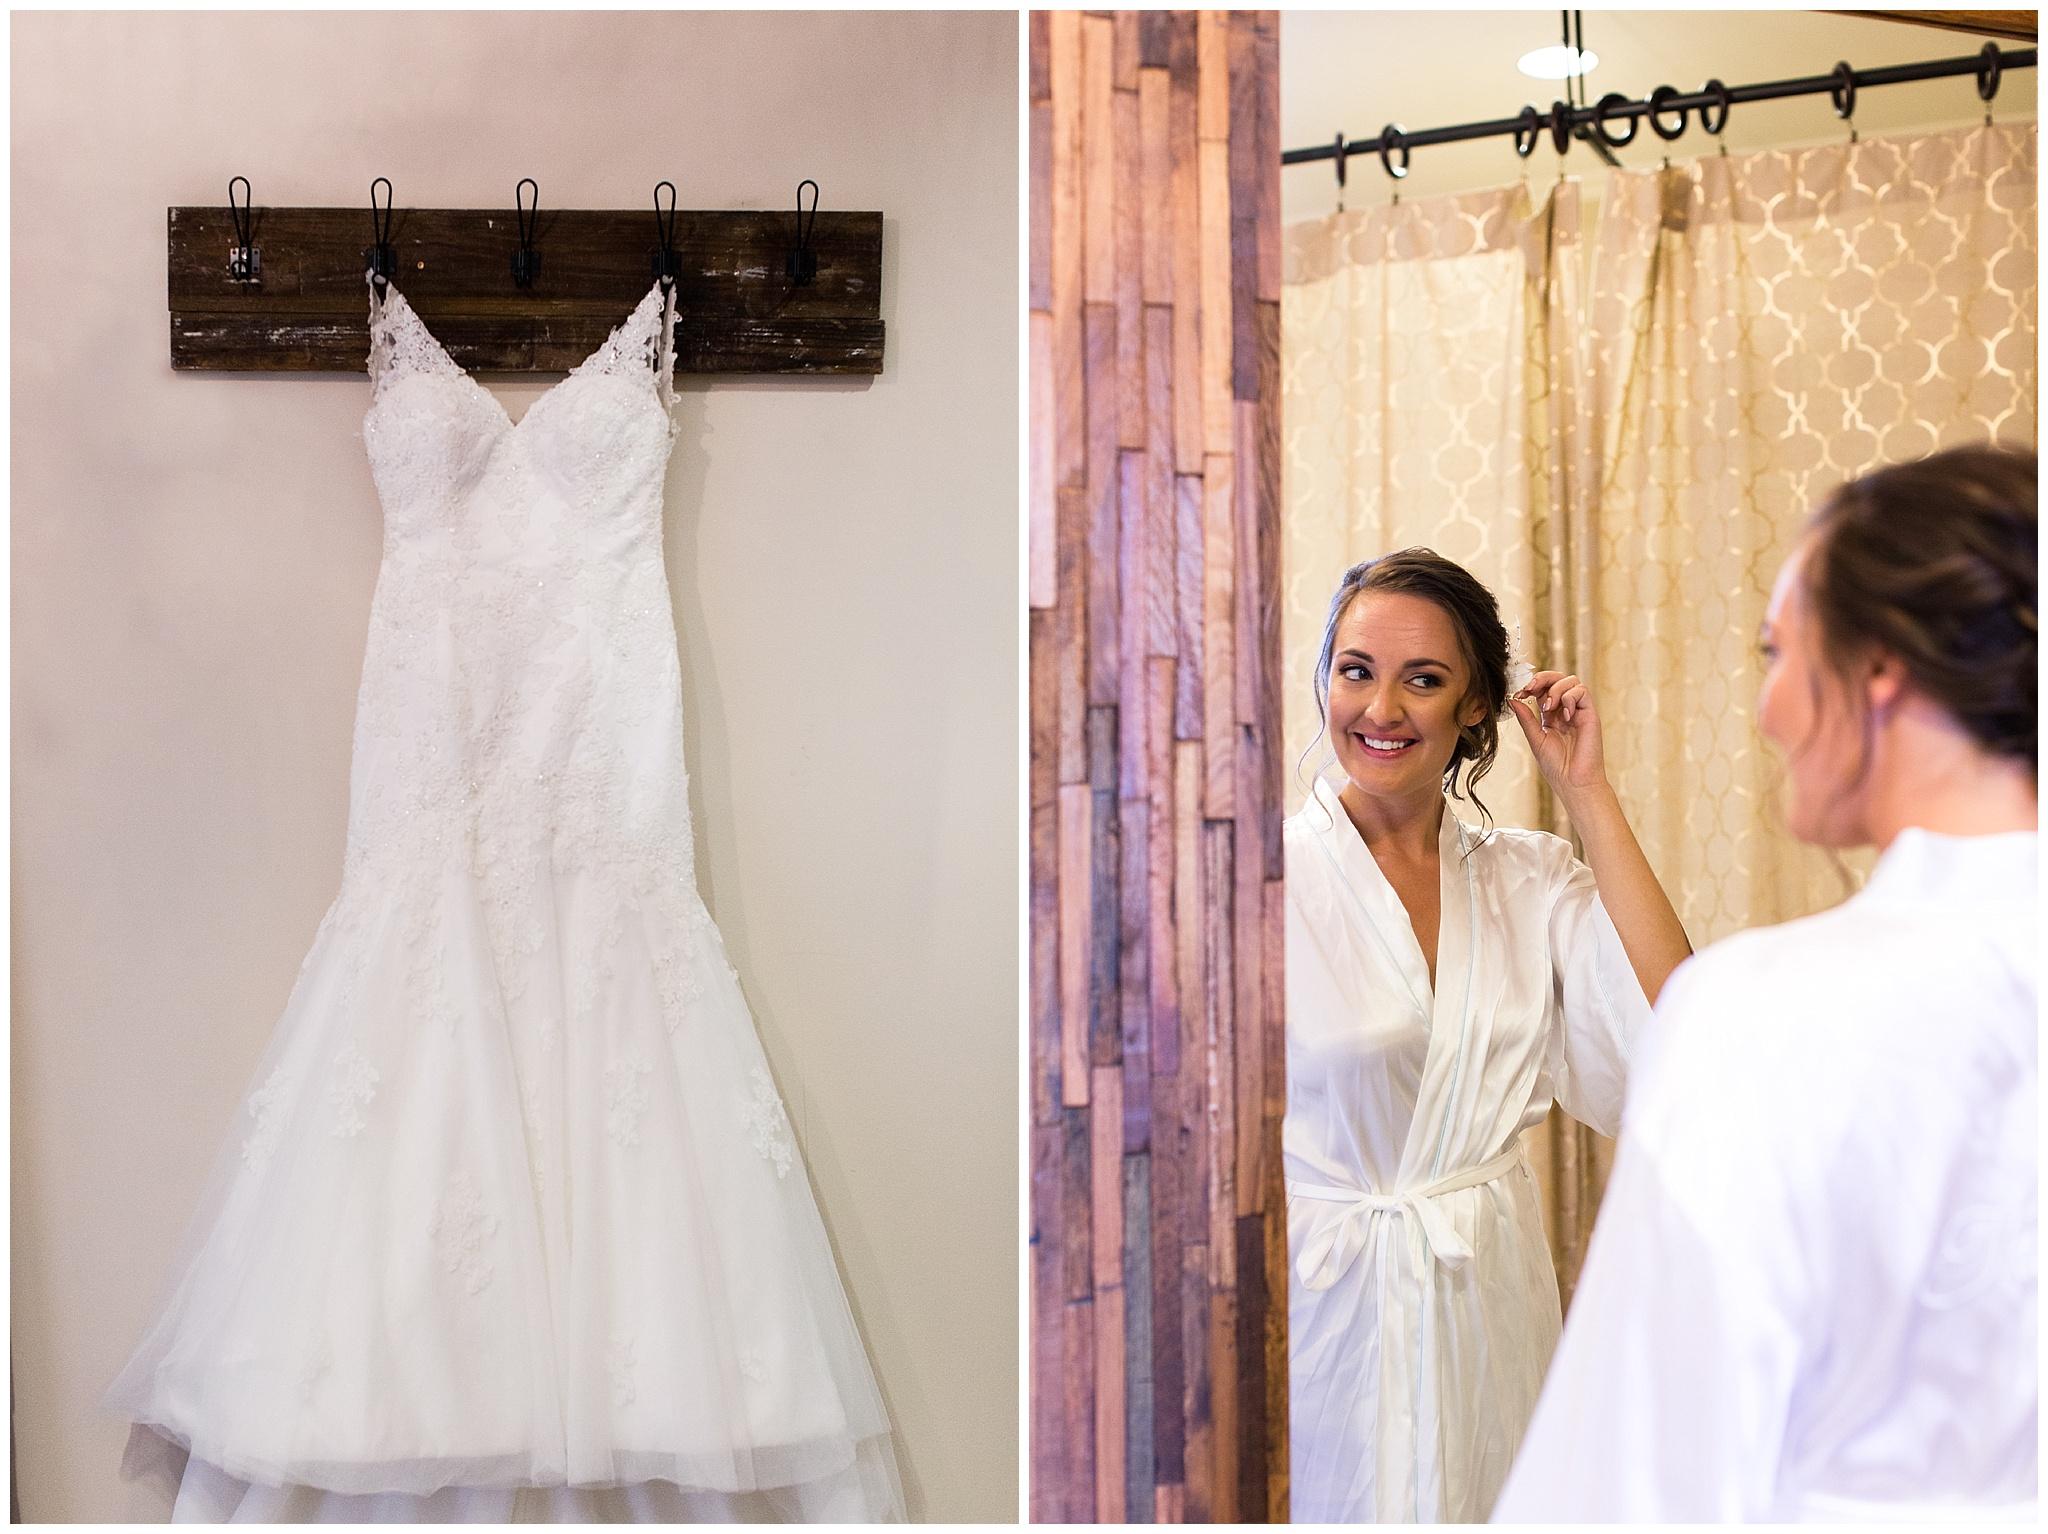 Vinny-Cayt-Wedding-04-26-18-0413.jpg